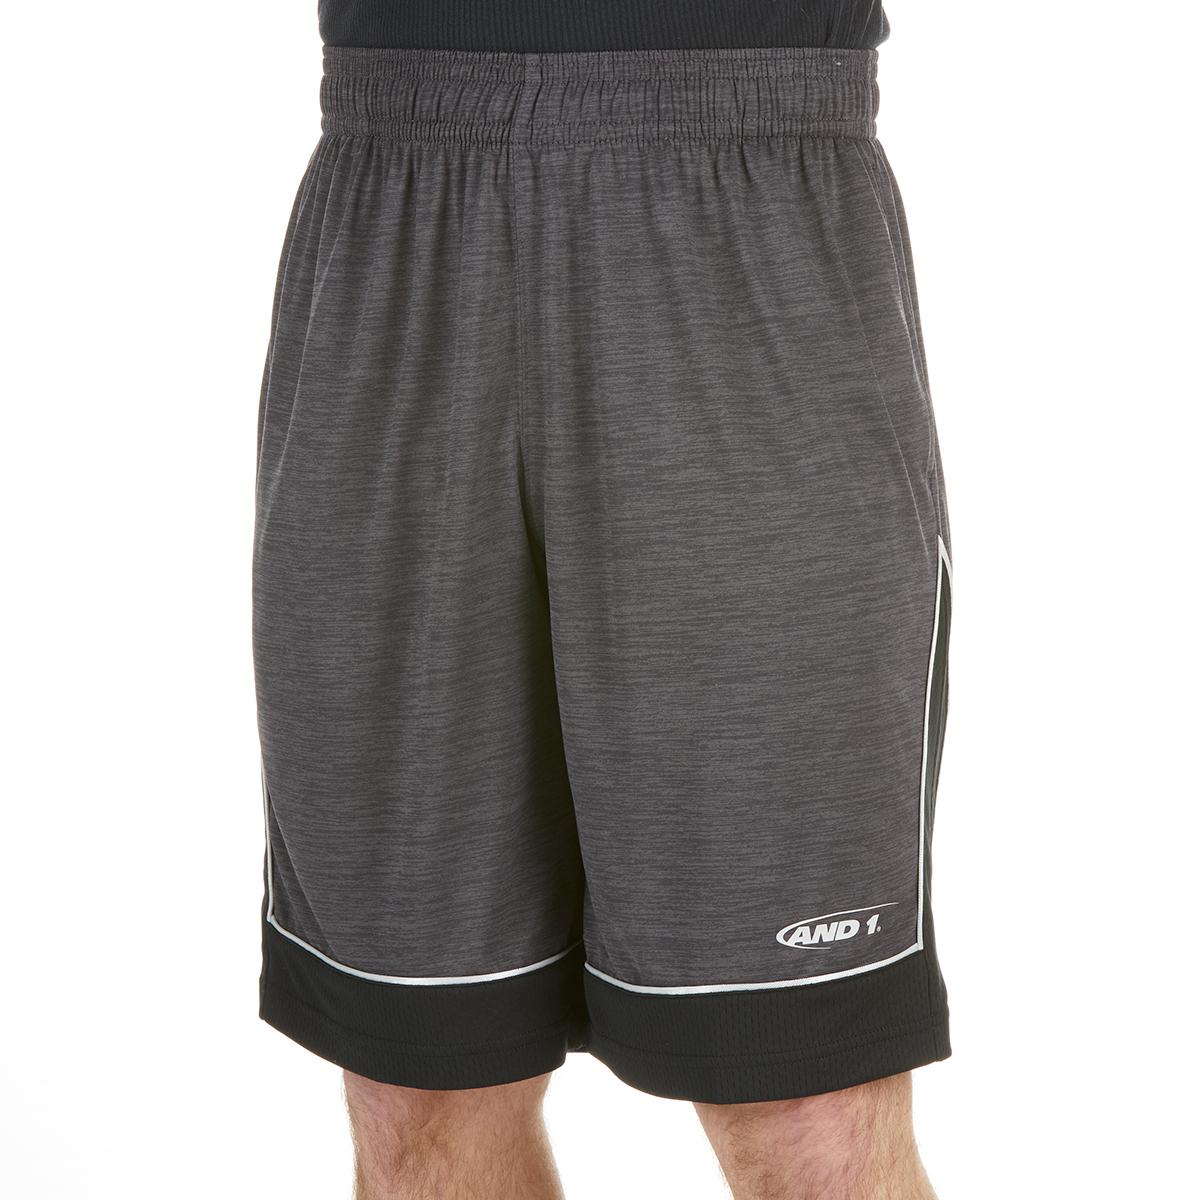 And1 Men's 6Th Man Basketball Short - Black, M